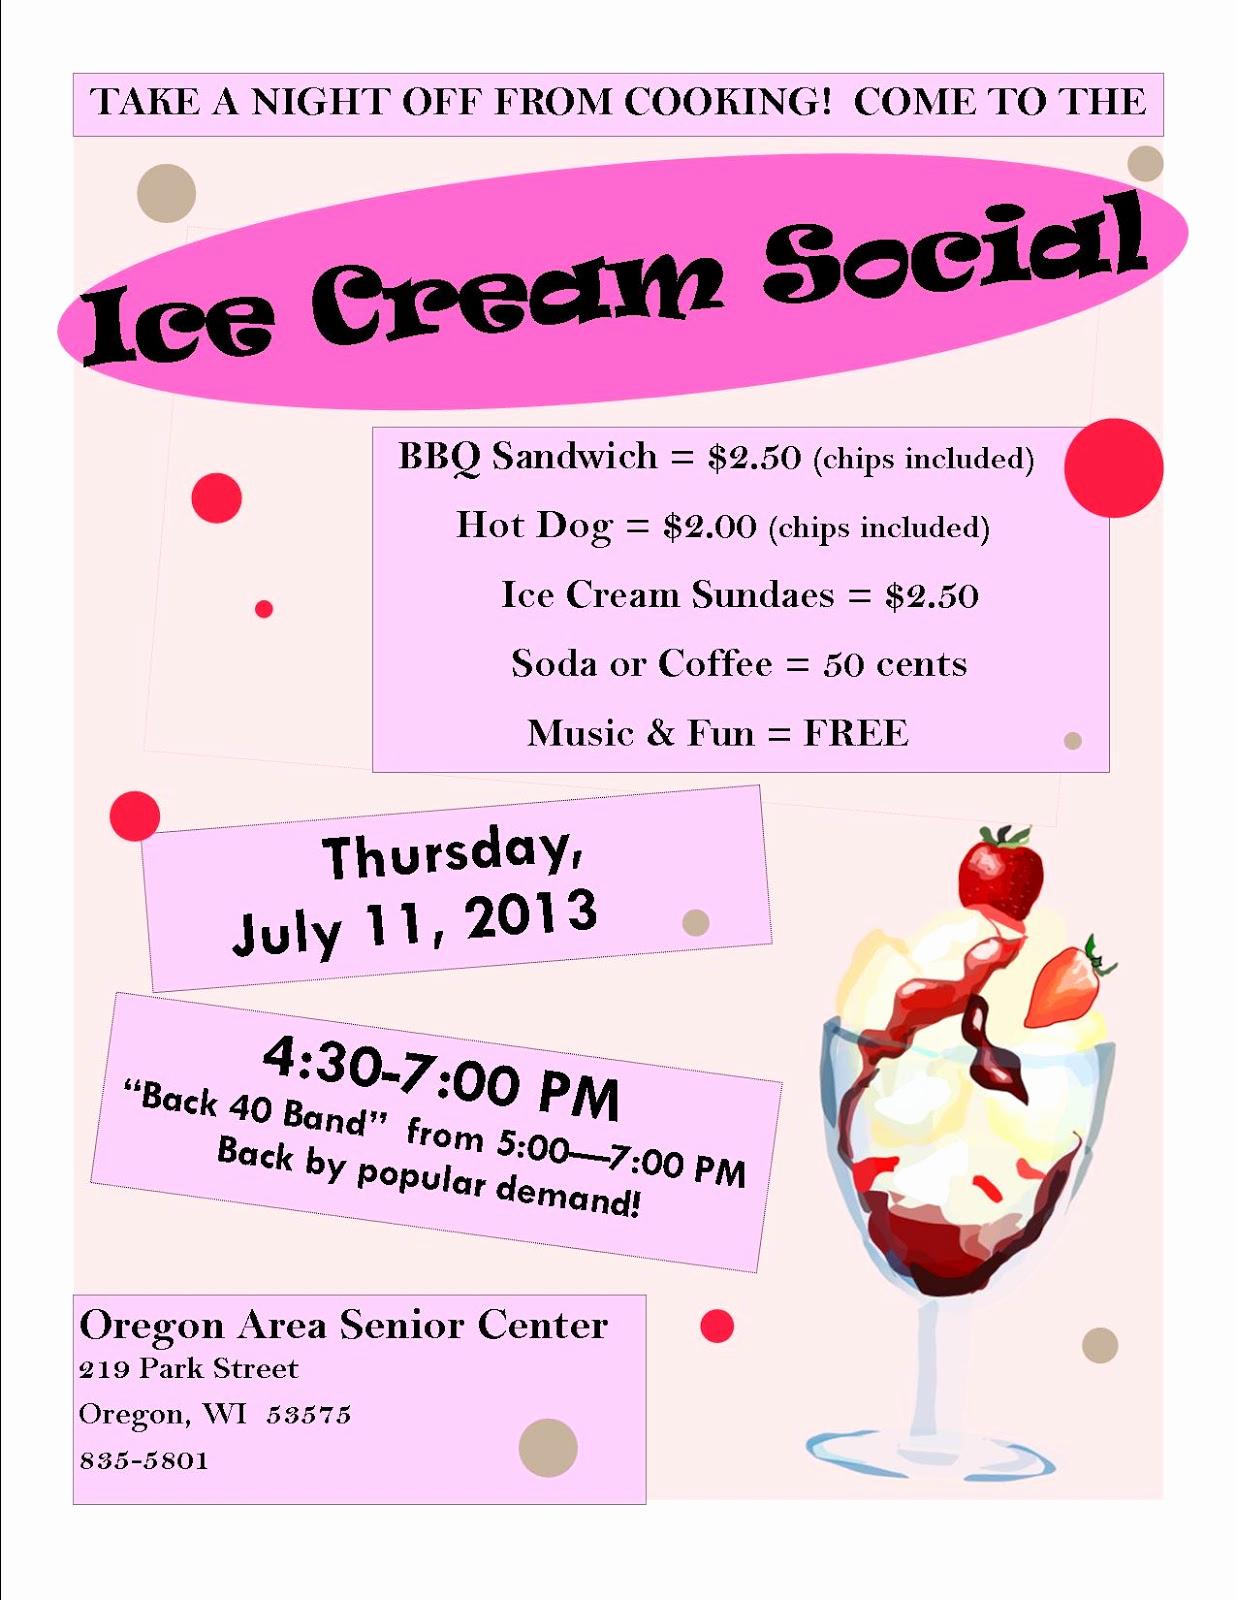 Ice Cream social Flyer Elegant oregon area Senior Center Council On Aging 07 01 2013